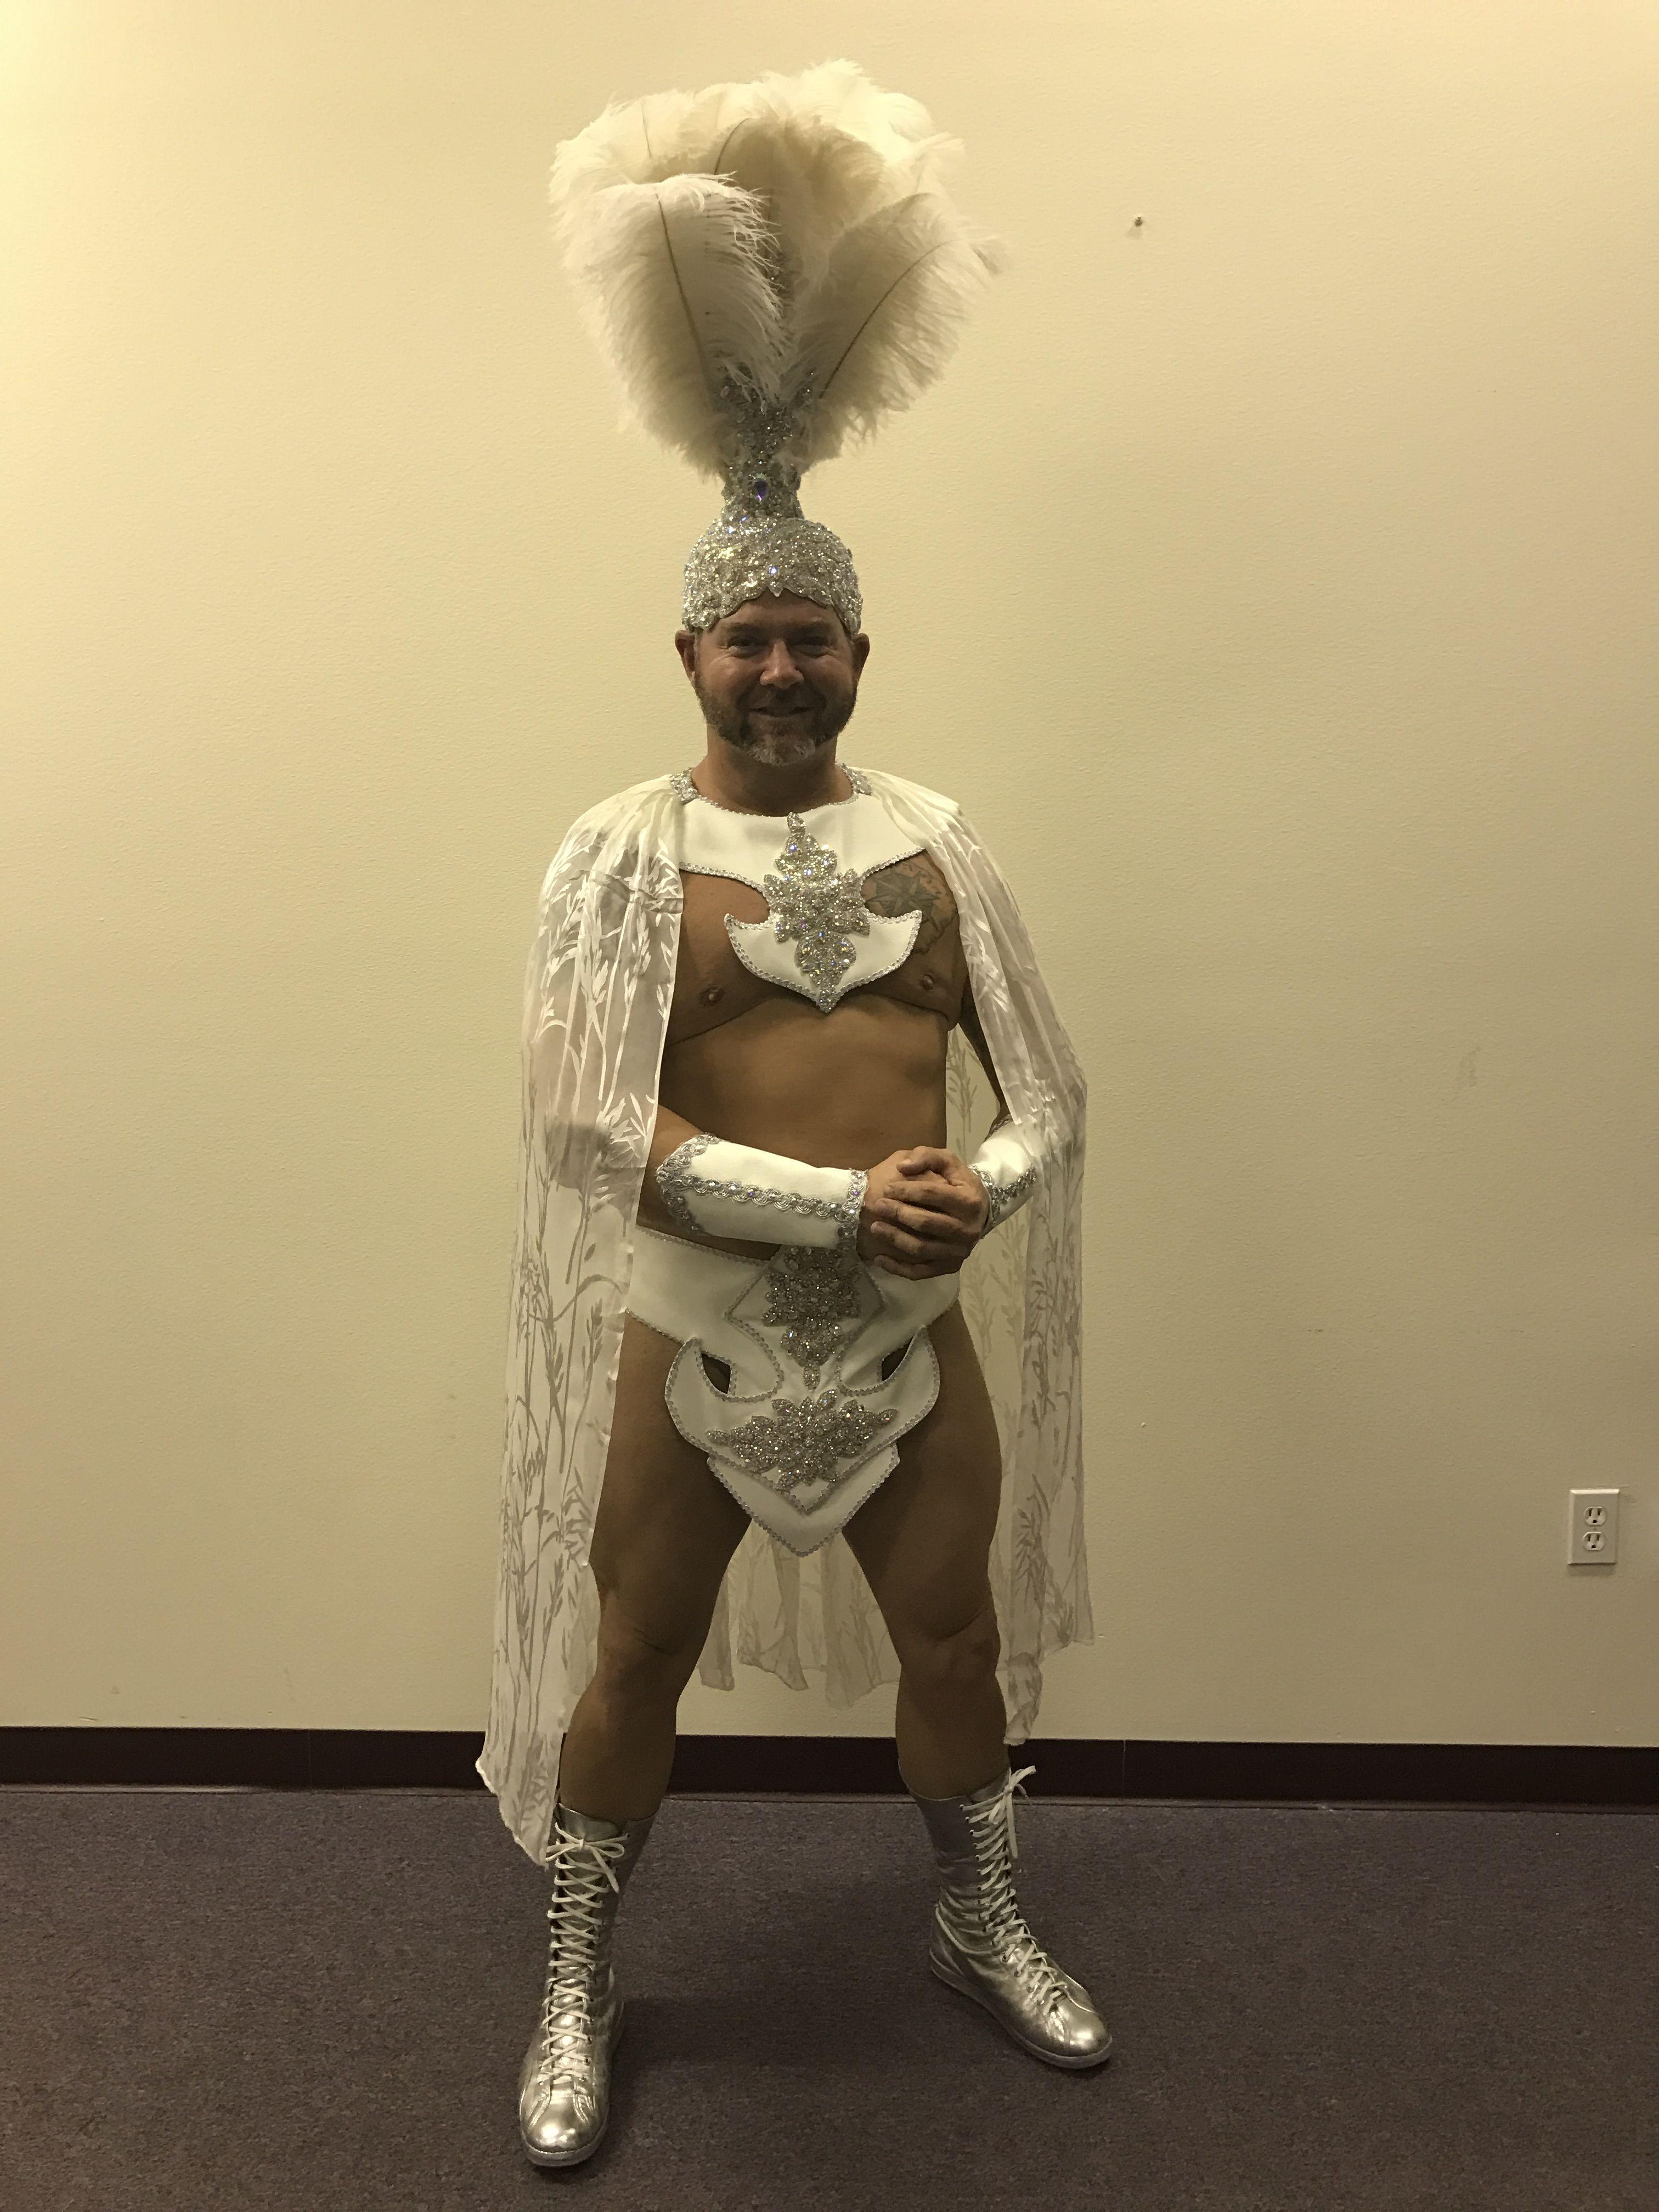 Showgirl gladiator